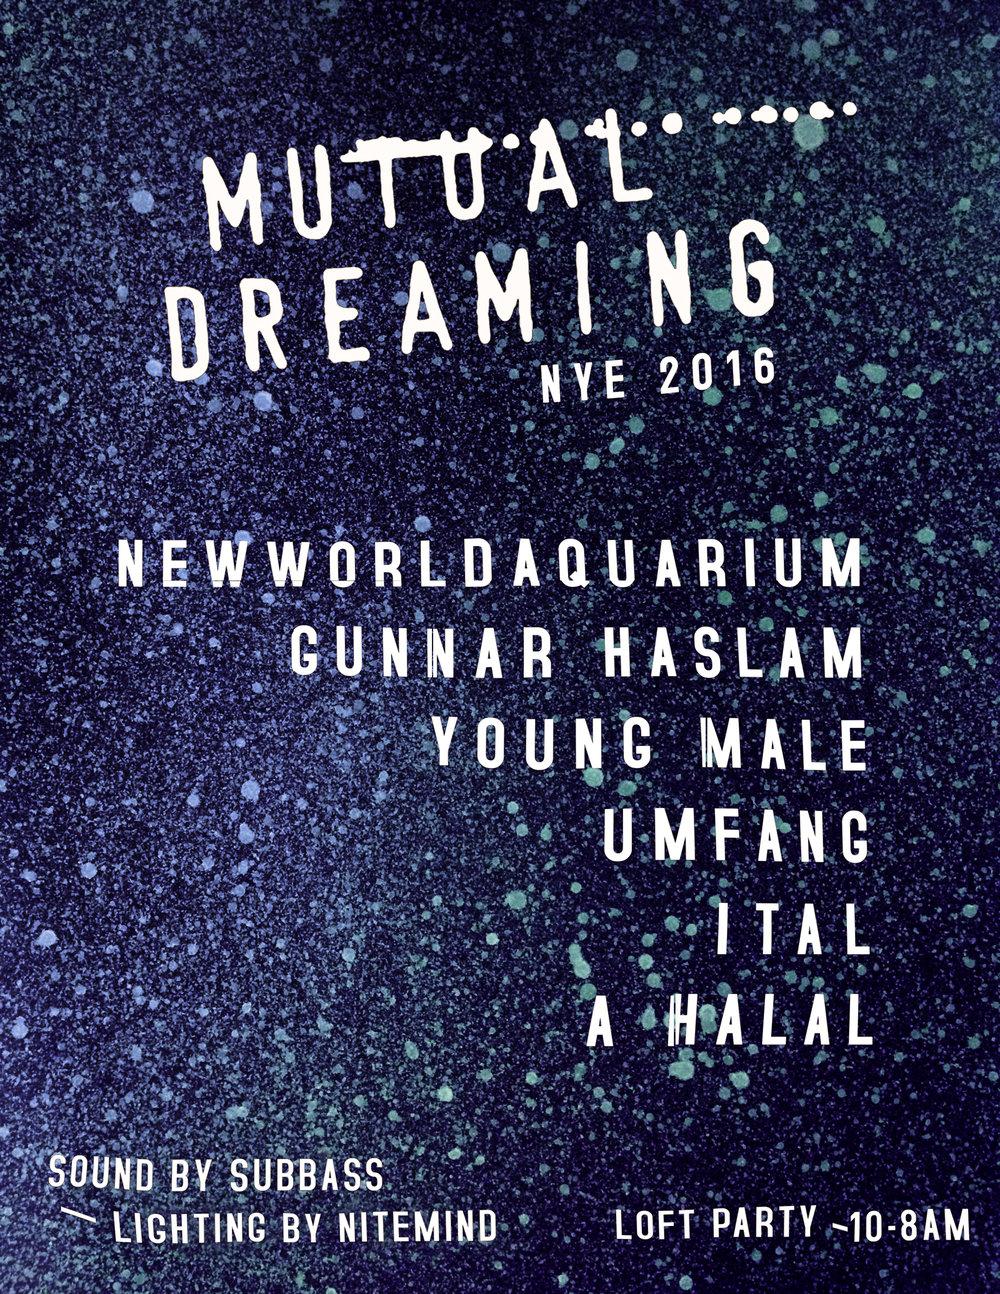 Mutual Dreaming NYE: Newworldaquarium, Gunnar Haslam, Young Male, Umfang, Ital, A. Halal  2016